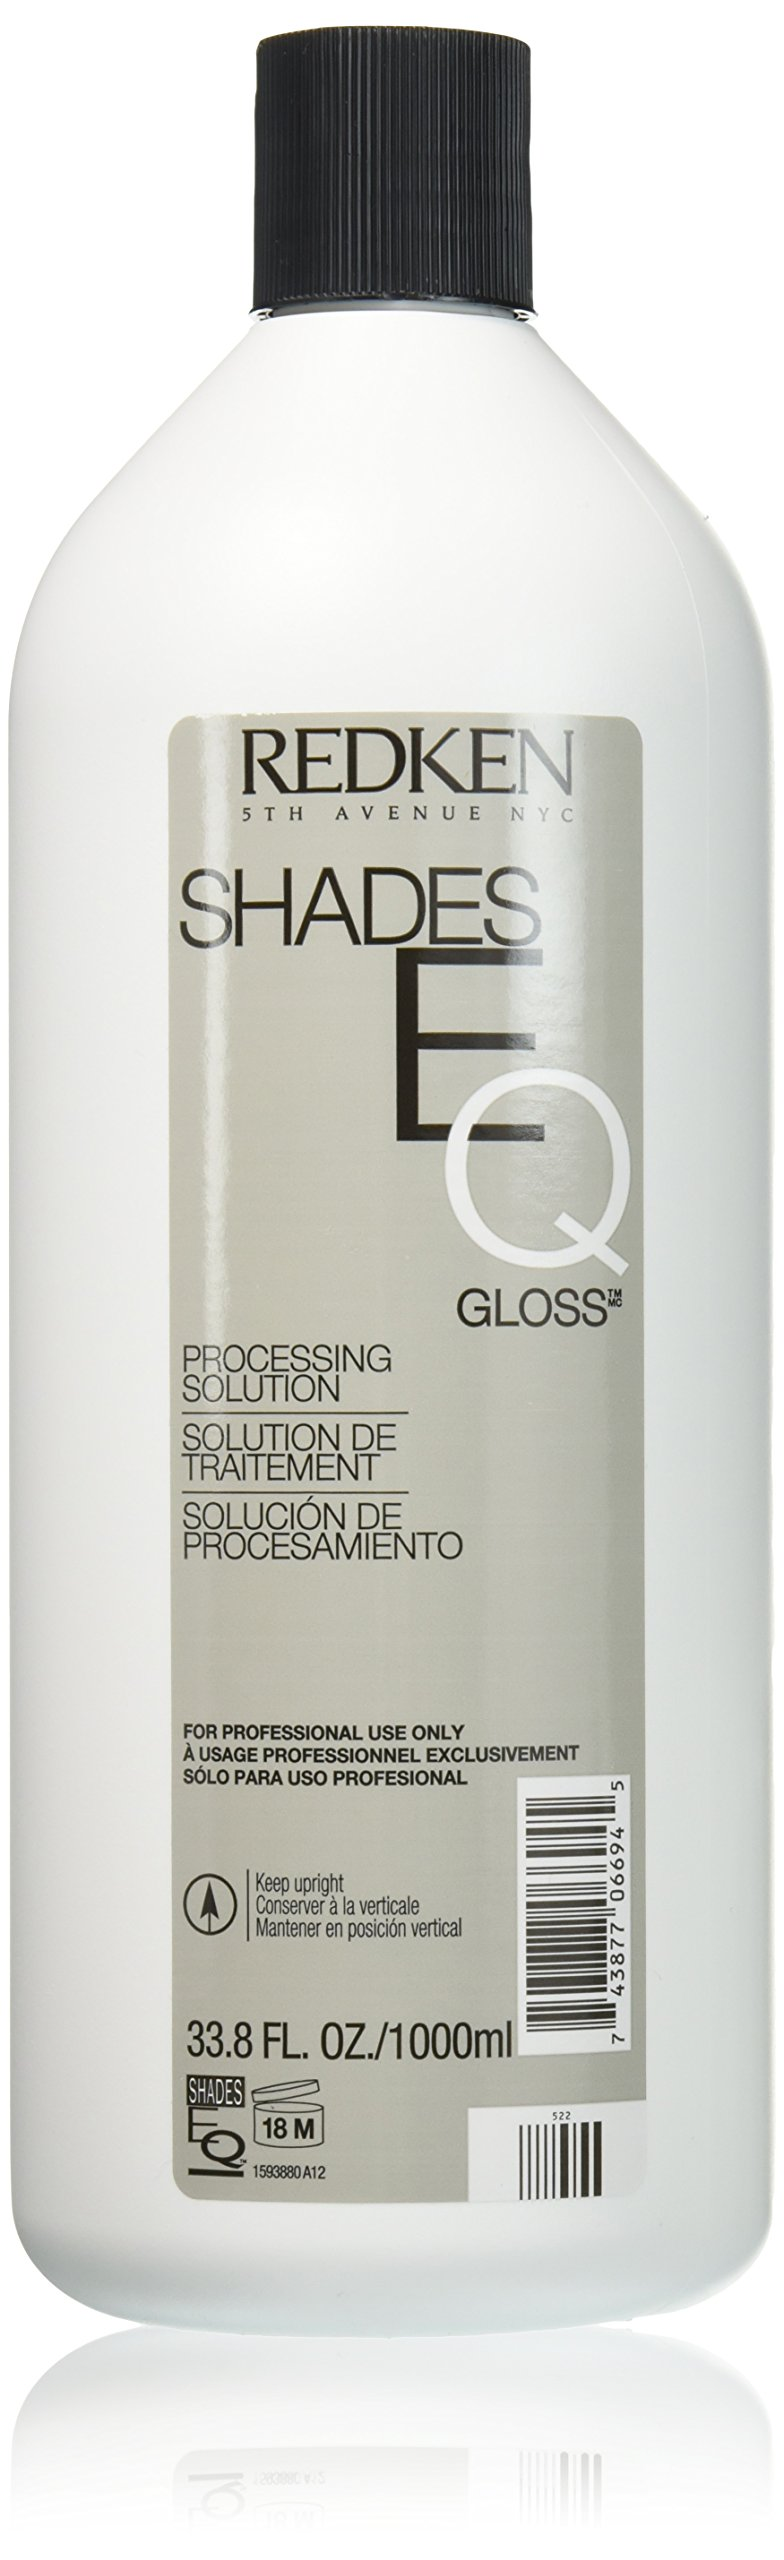 Redken Shades EQ Gloss Processing Solution 33.8 Oz (1000 ml) by REDKEN